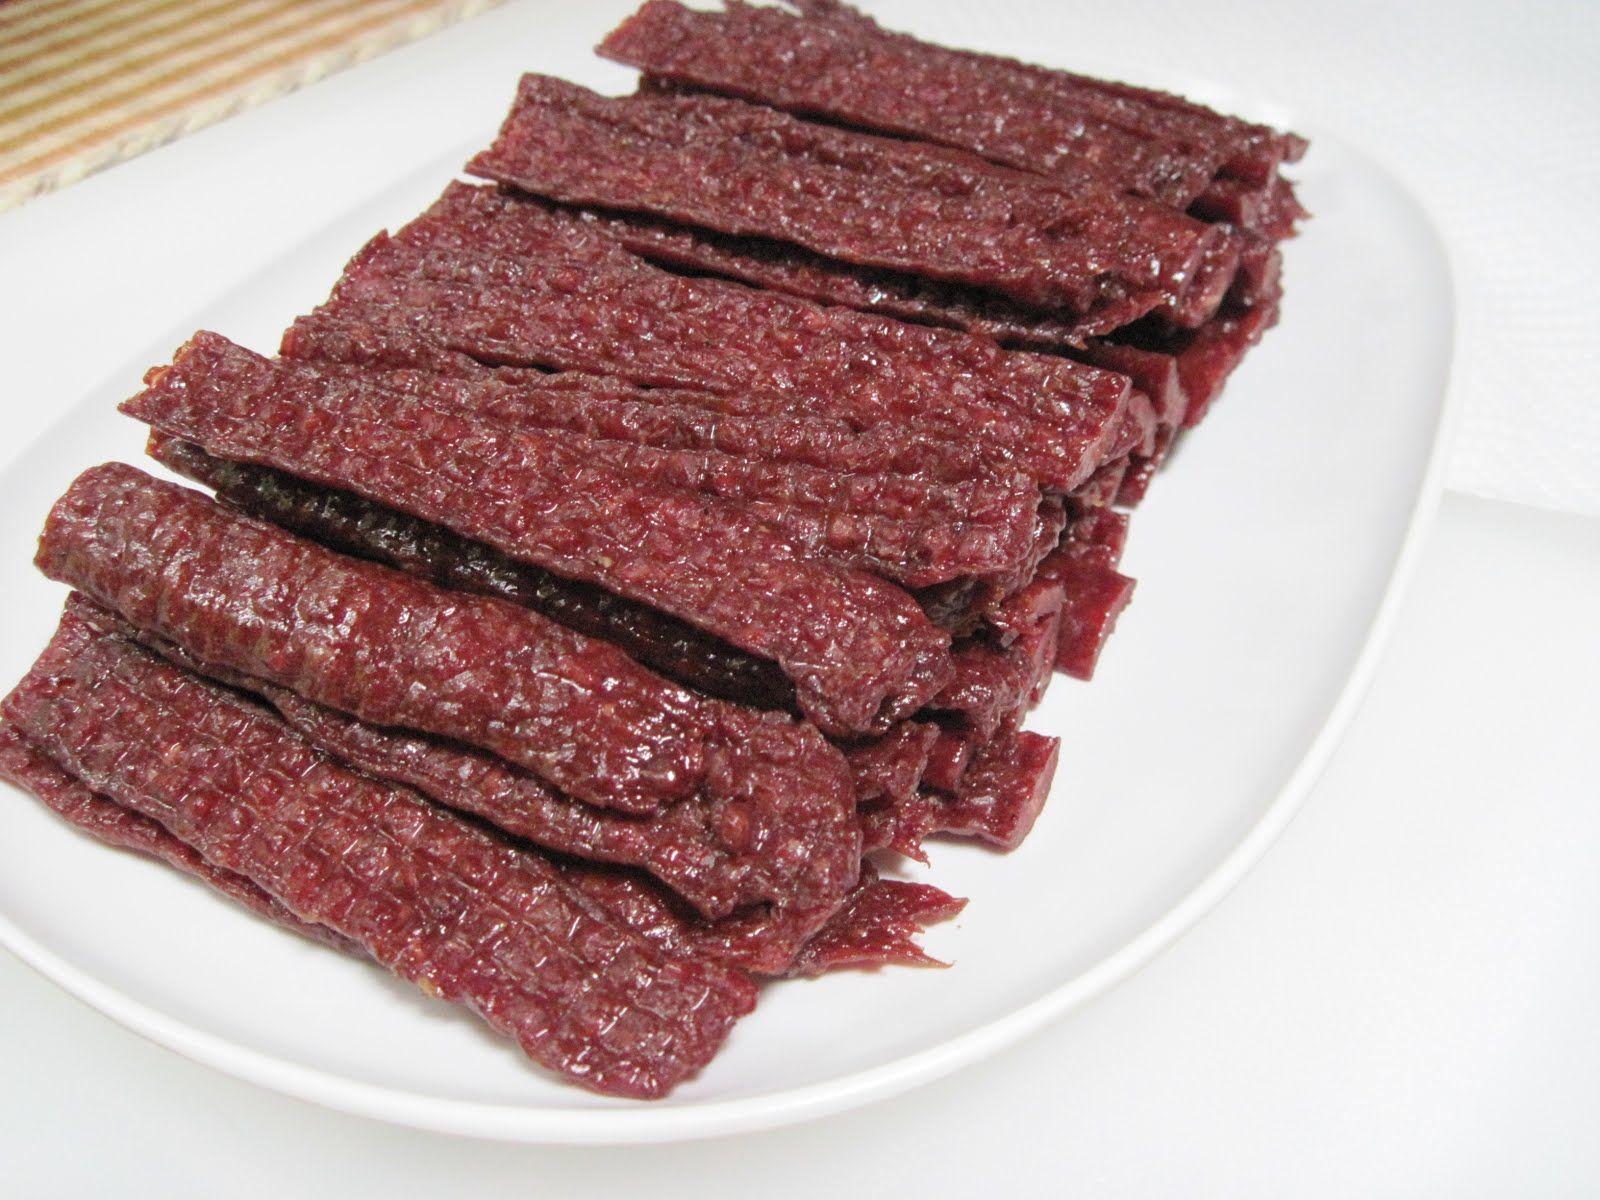 Teriyaki Beef Jerky In 2020 Beef Jerky Recipes Ground Beef Jerky Recipe Jerky Recipes